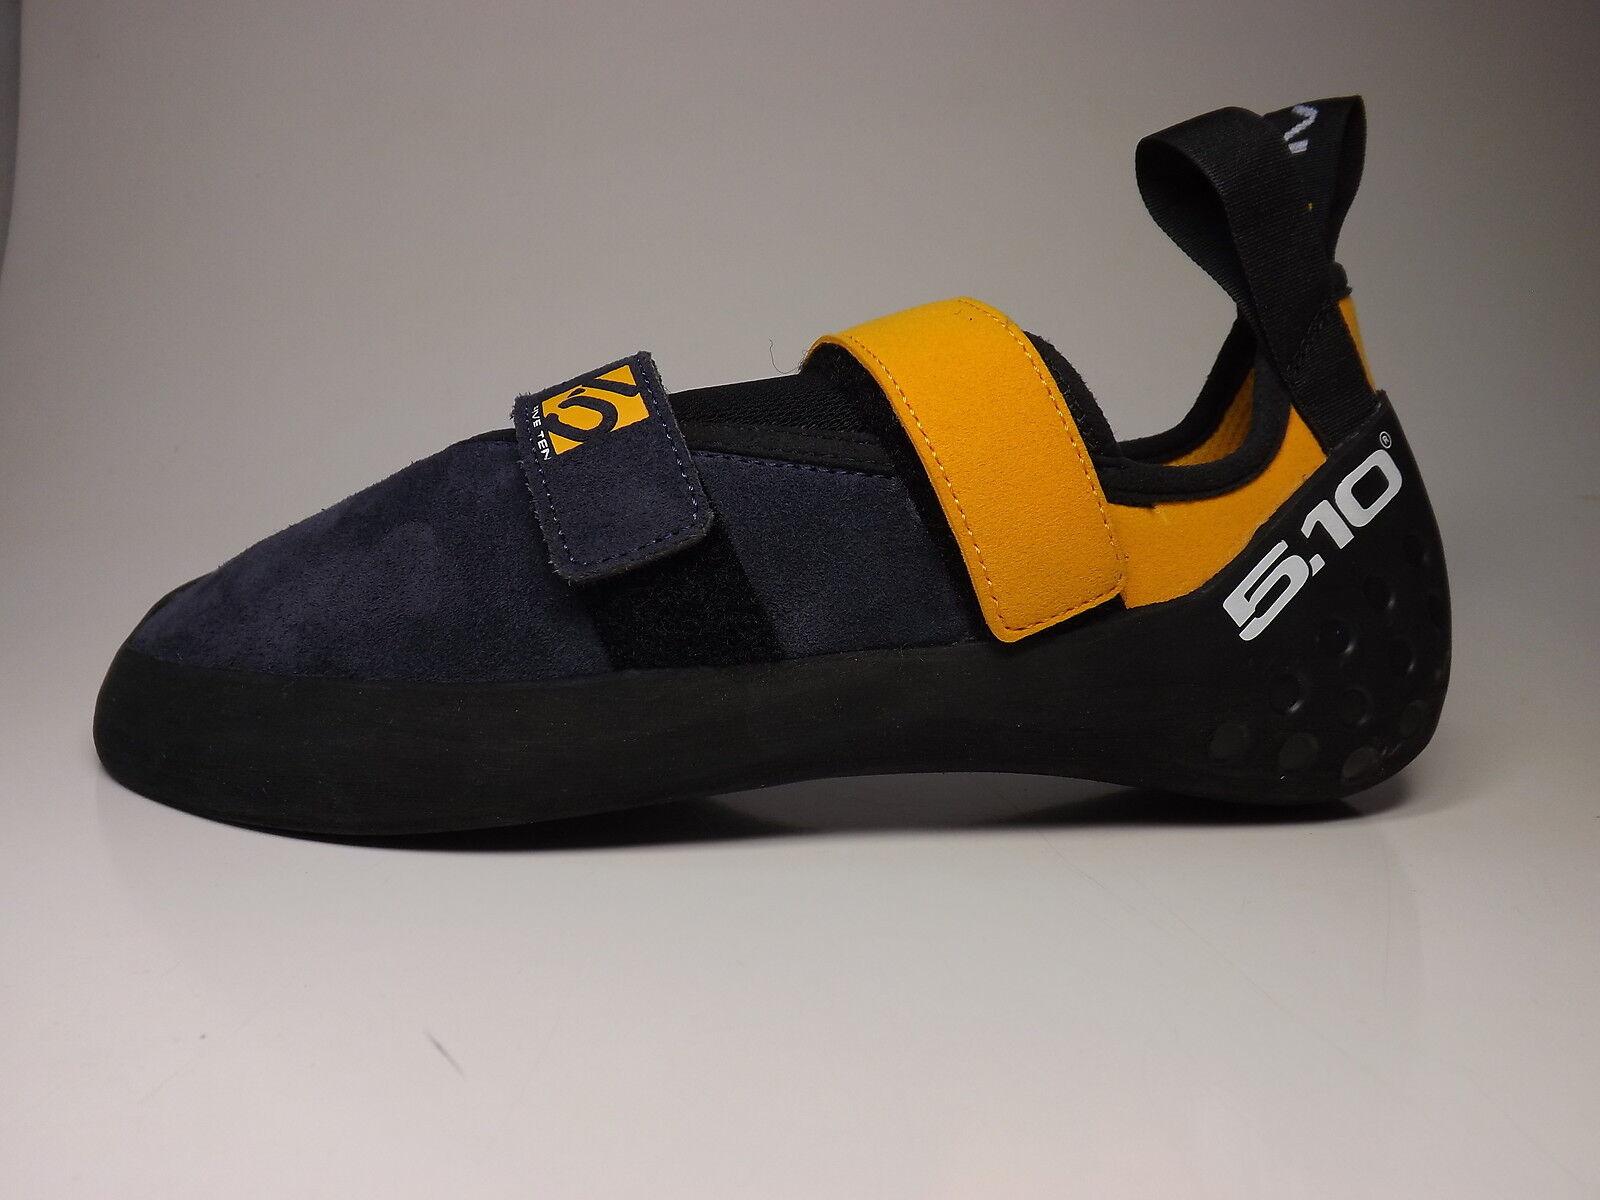 5.10 Five Ten Wall Master Comfortable Climbing shoes Stone Master